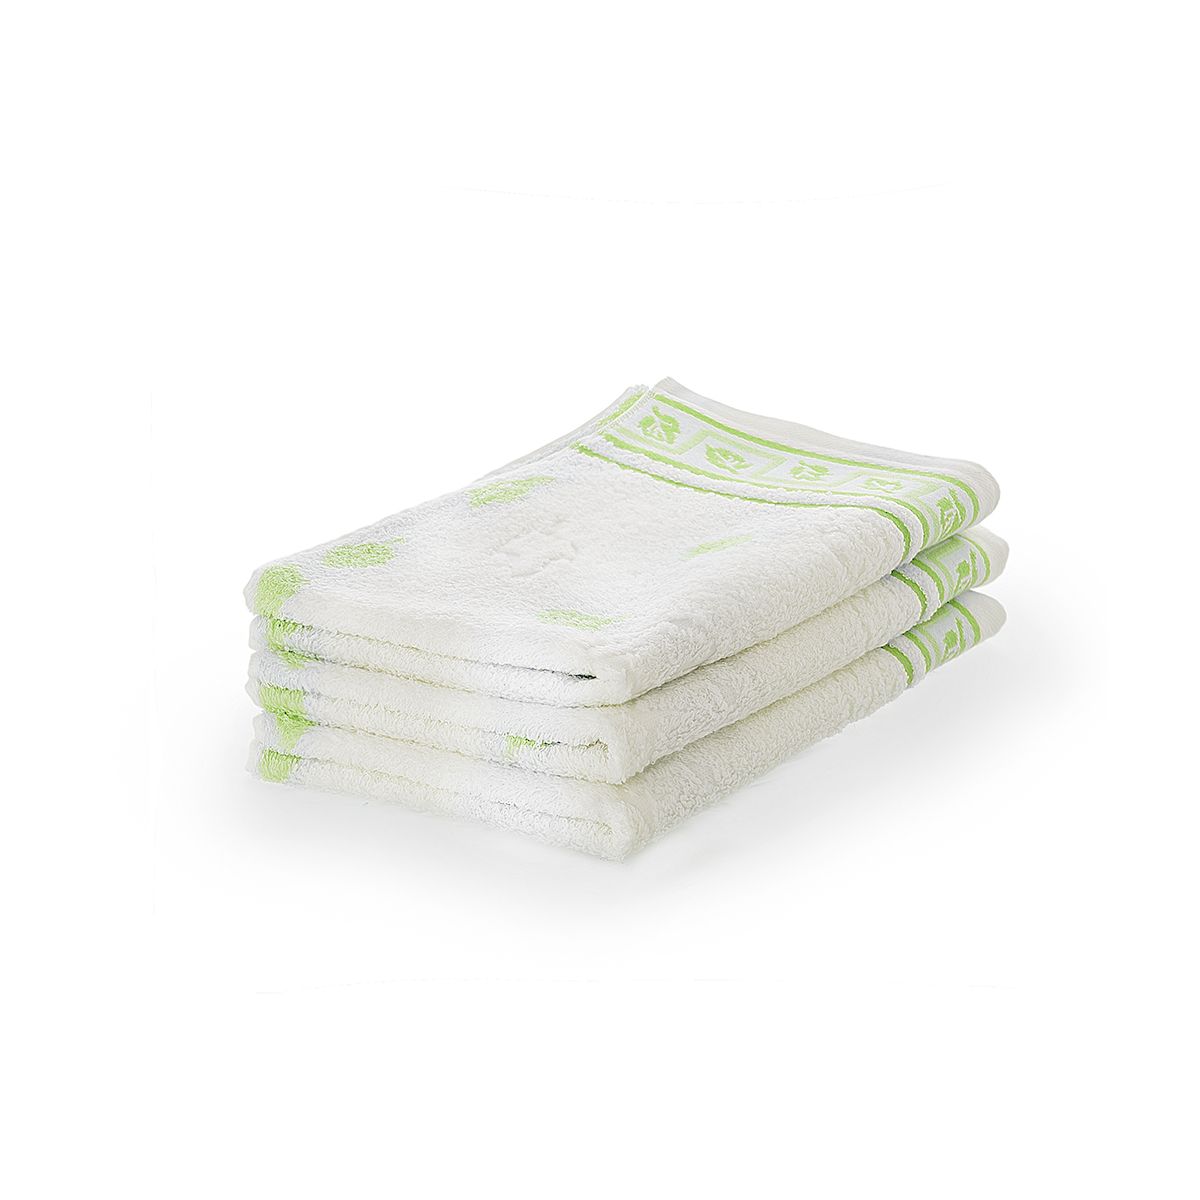 Полотенце Листопад Зеленый, размер 65х135 смМахровые полотенца<br>Плотность ткани: 480 г/кв. м.<br><br>Тип: Полотенце<br>Размер: 65х135<br>Материал: Махра